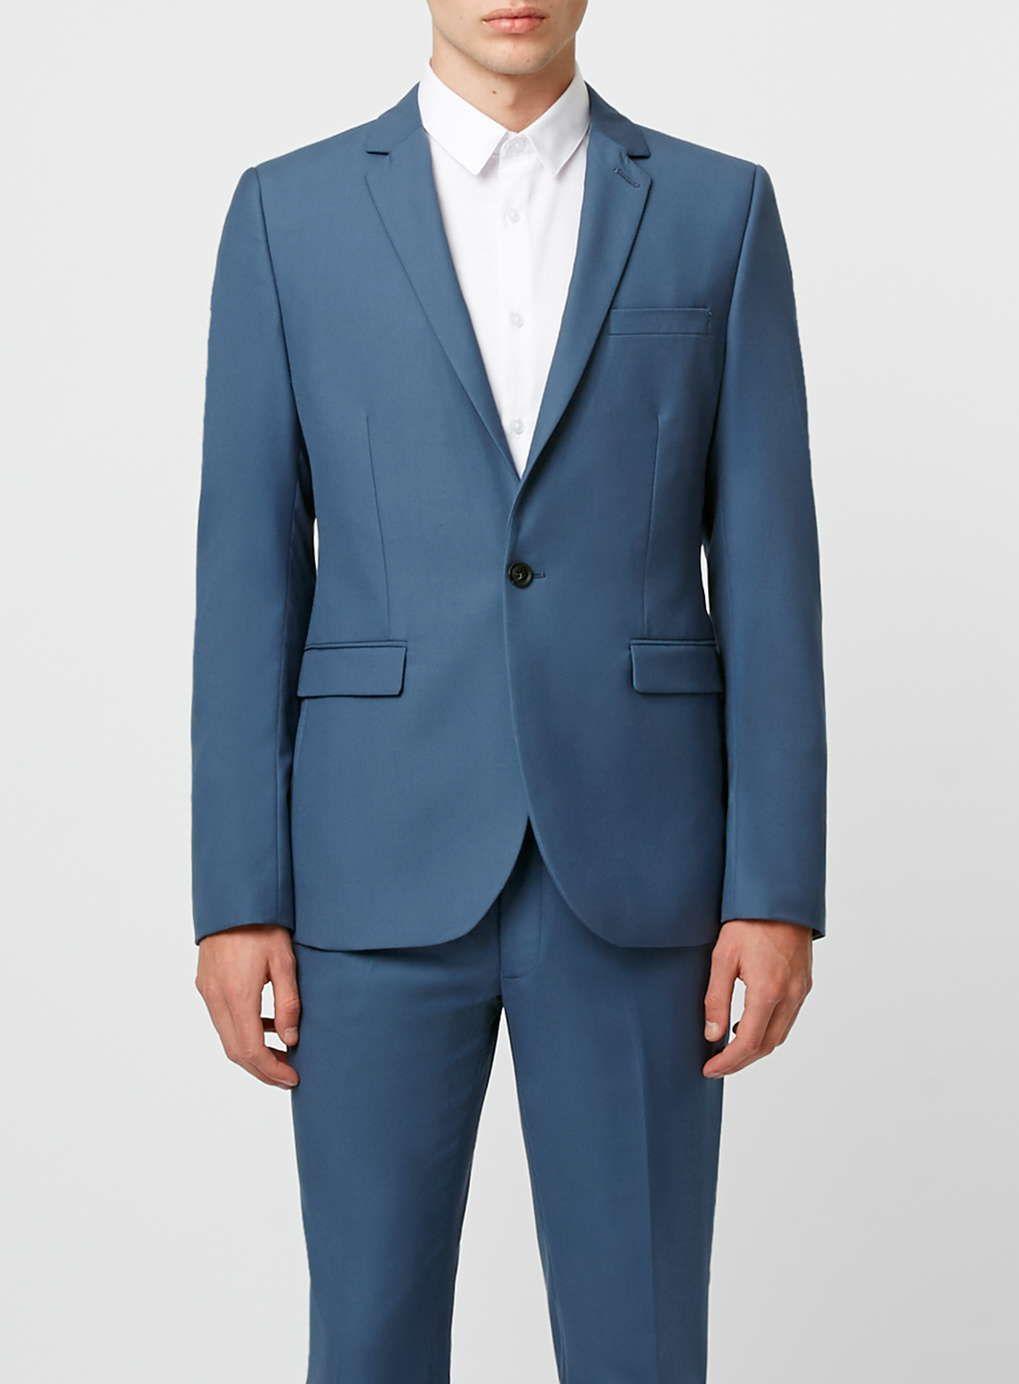 Mid Blue Skinny Fit Suit - Skinny Fit Suits - Suits - TOPMAN ...